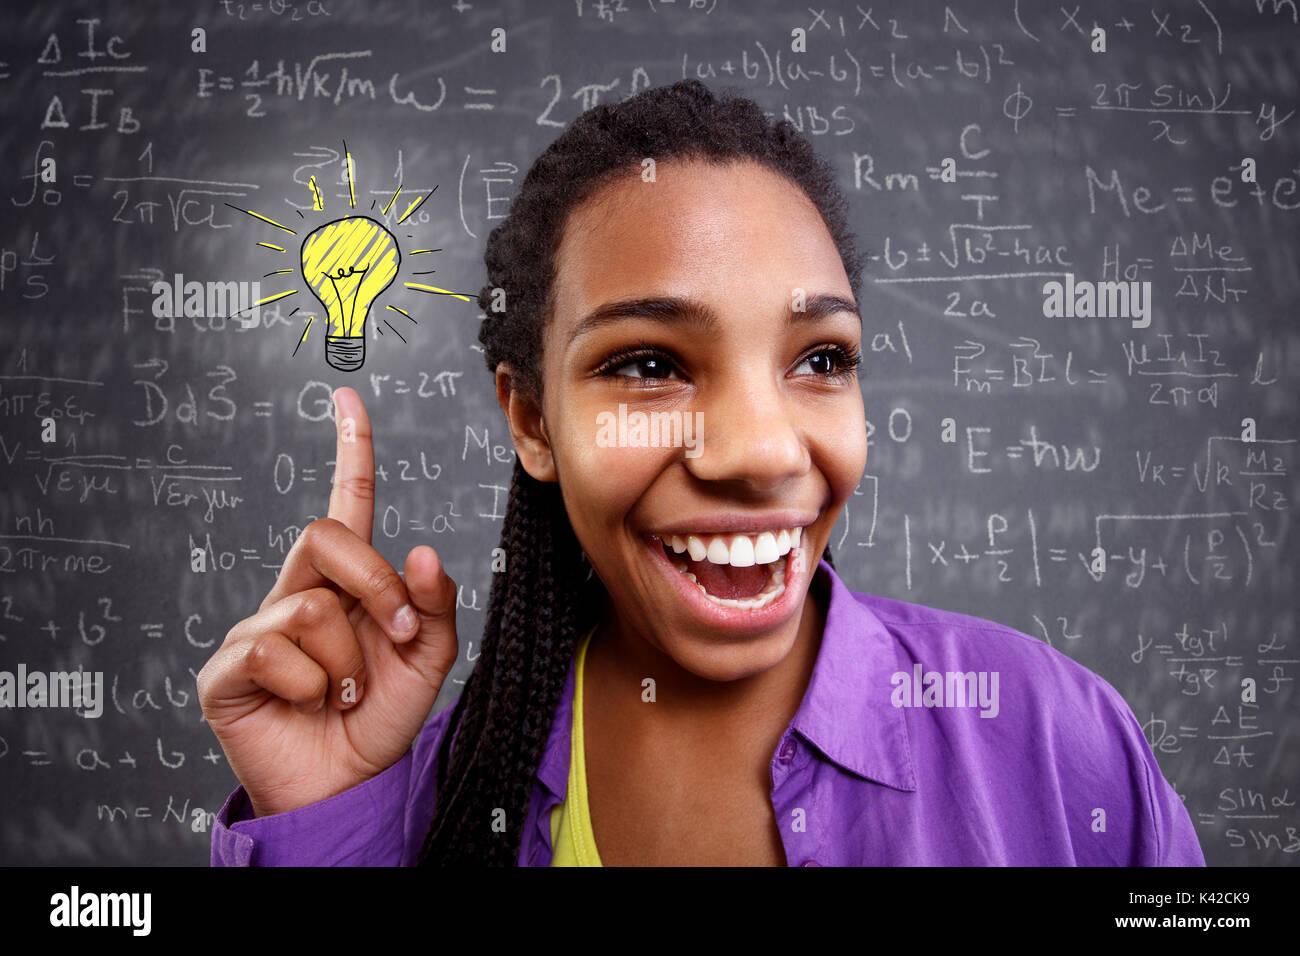 happy schoolgirl genius in mathematics have a solution - Stock Image